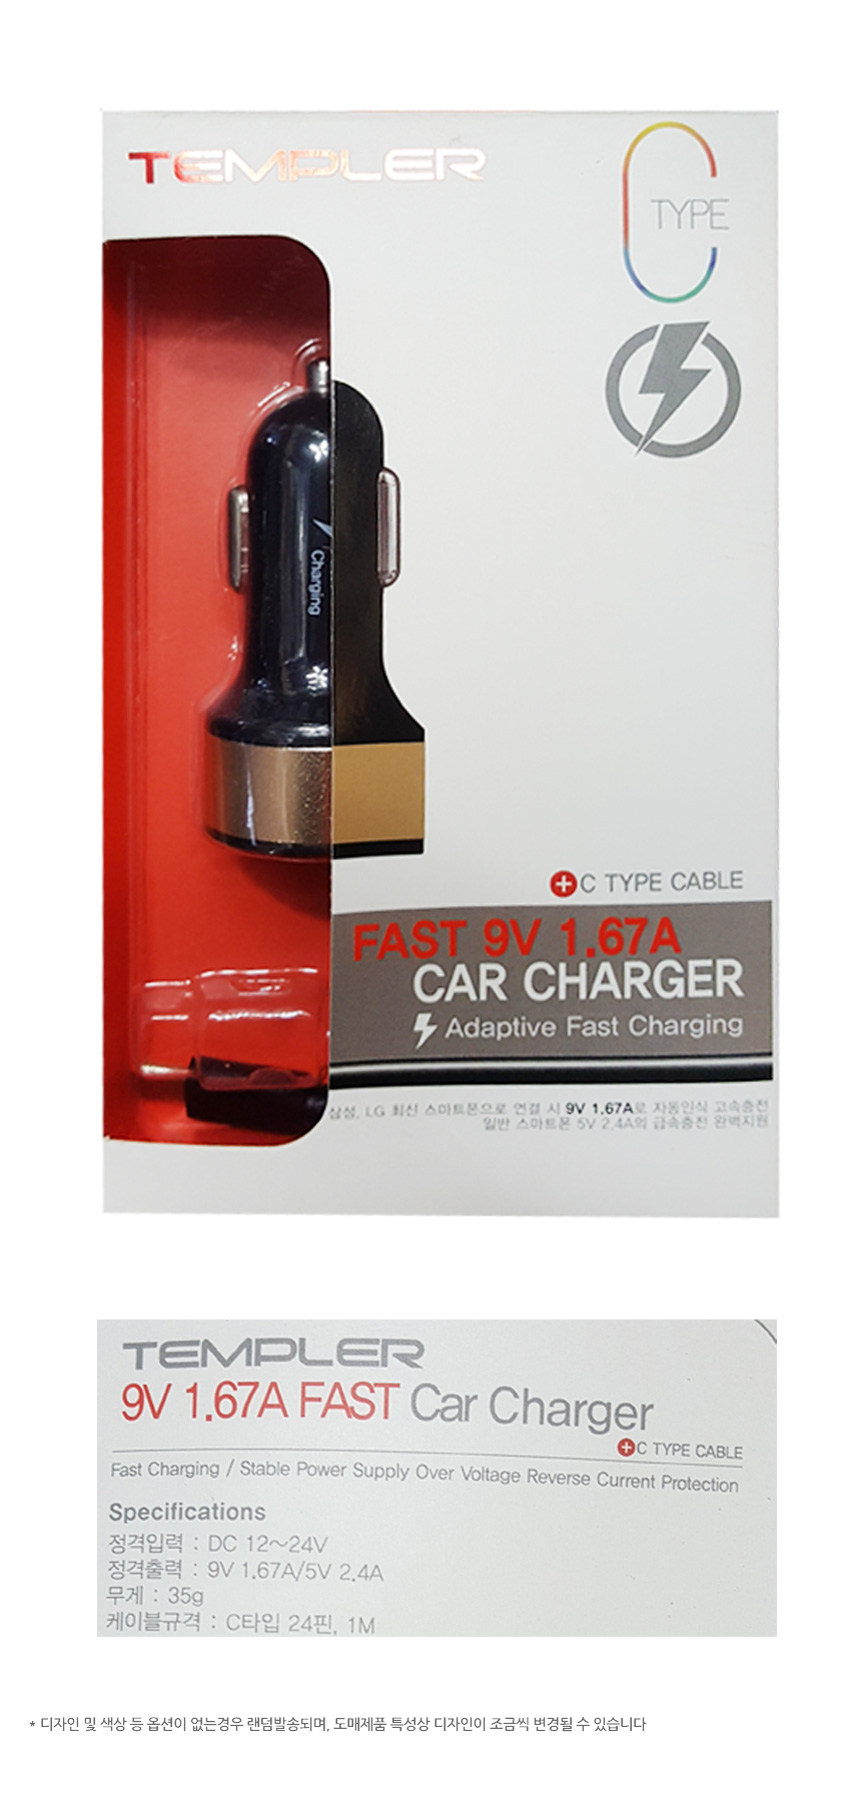 TEMPLER 9V 1.67A FAST Car Charger 차량용충전기 차 차량용충전기 차량폰충전기 고속충전기 자동차폰충전기 폰충전기